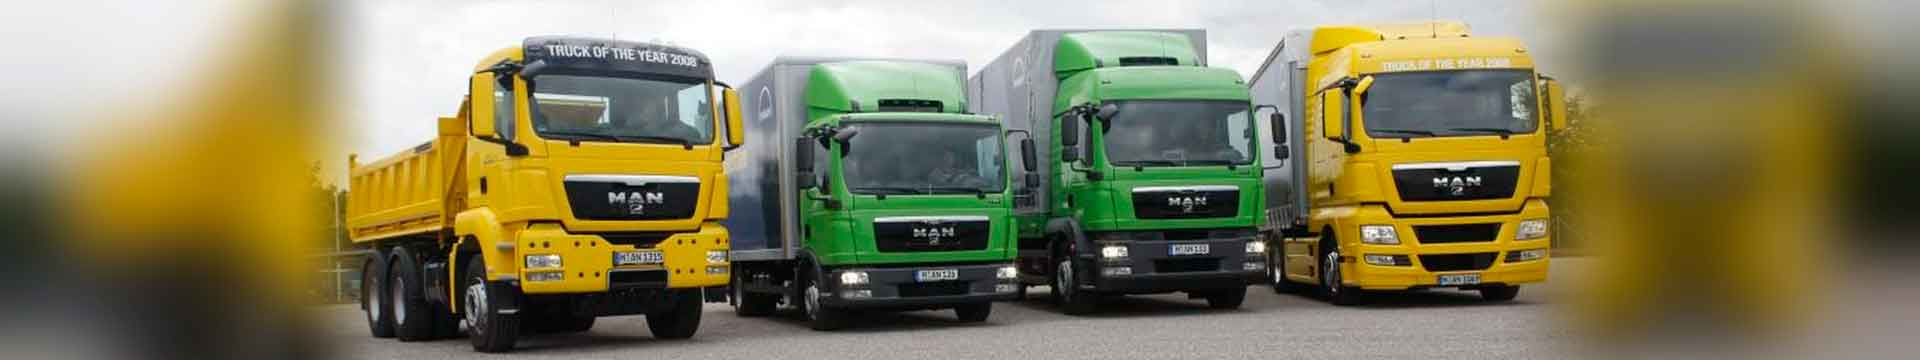 Модели грузовиков МАН